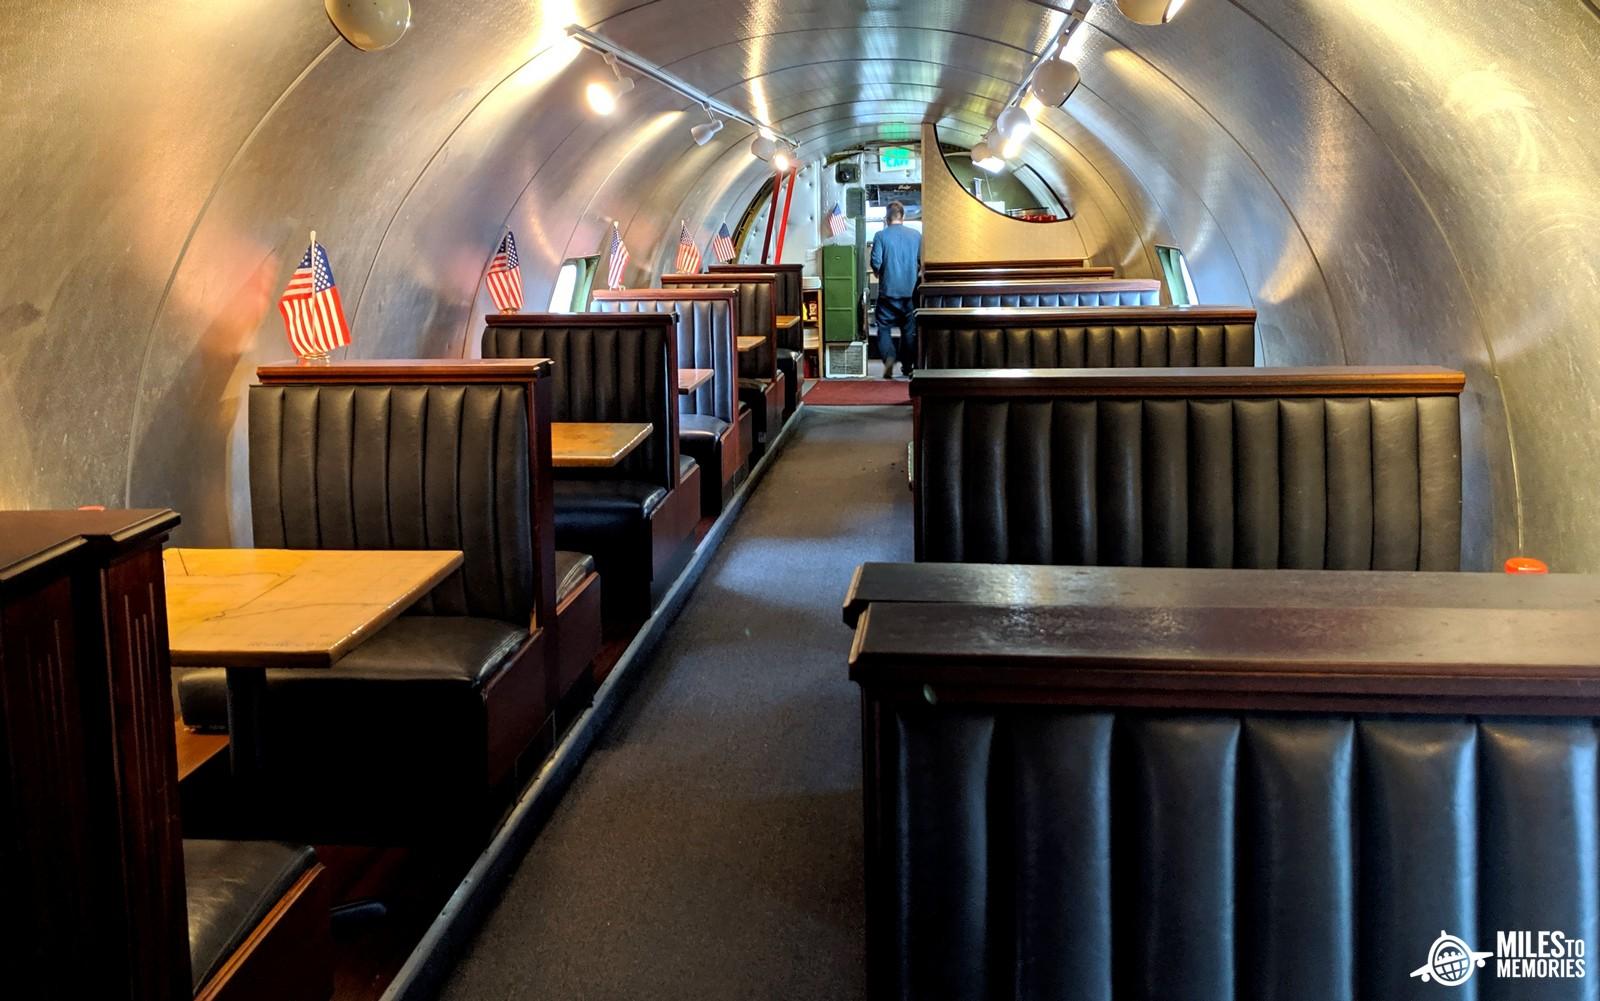 The Airplane Restaurant Colorado Springs Review